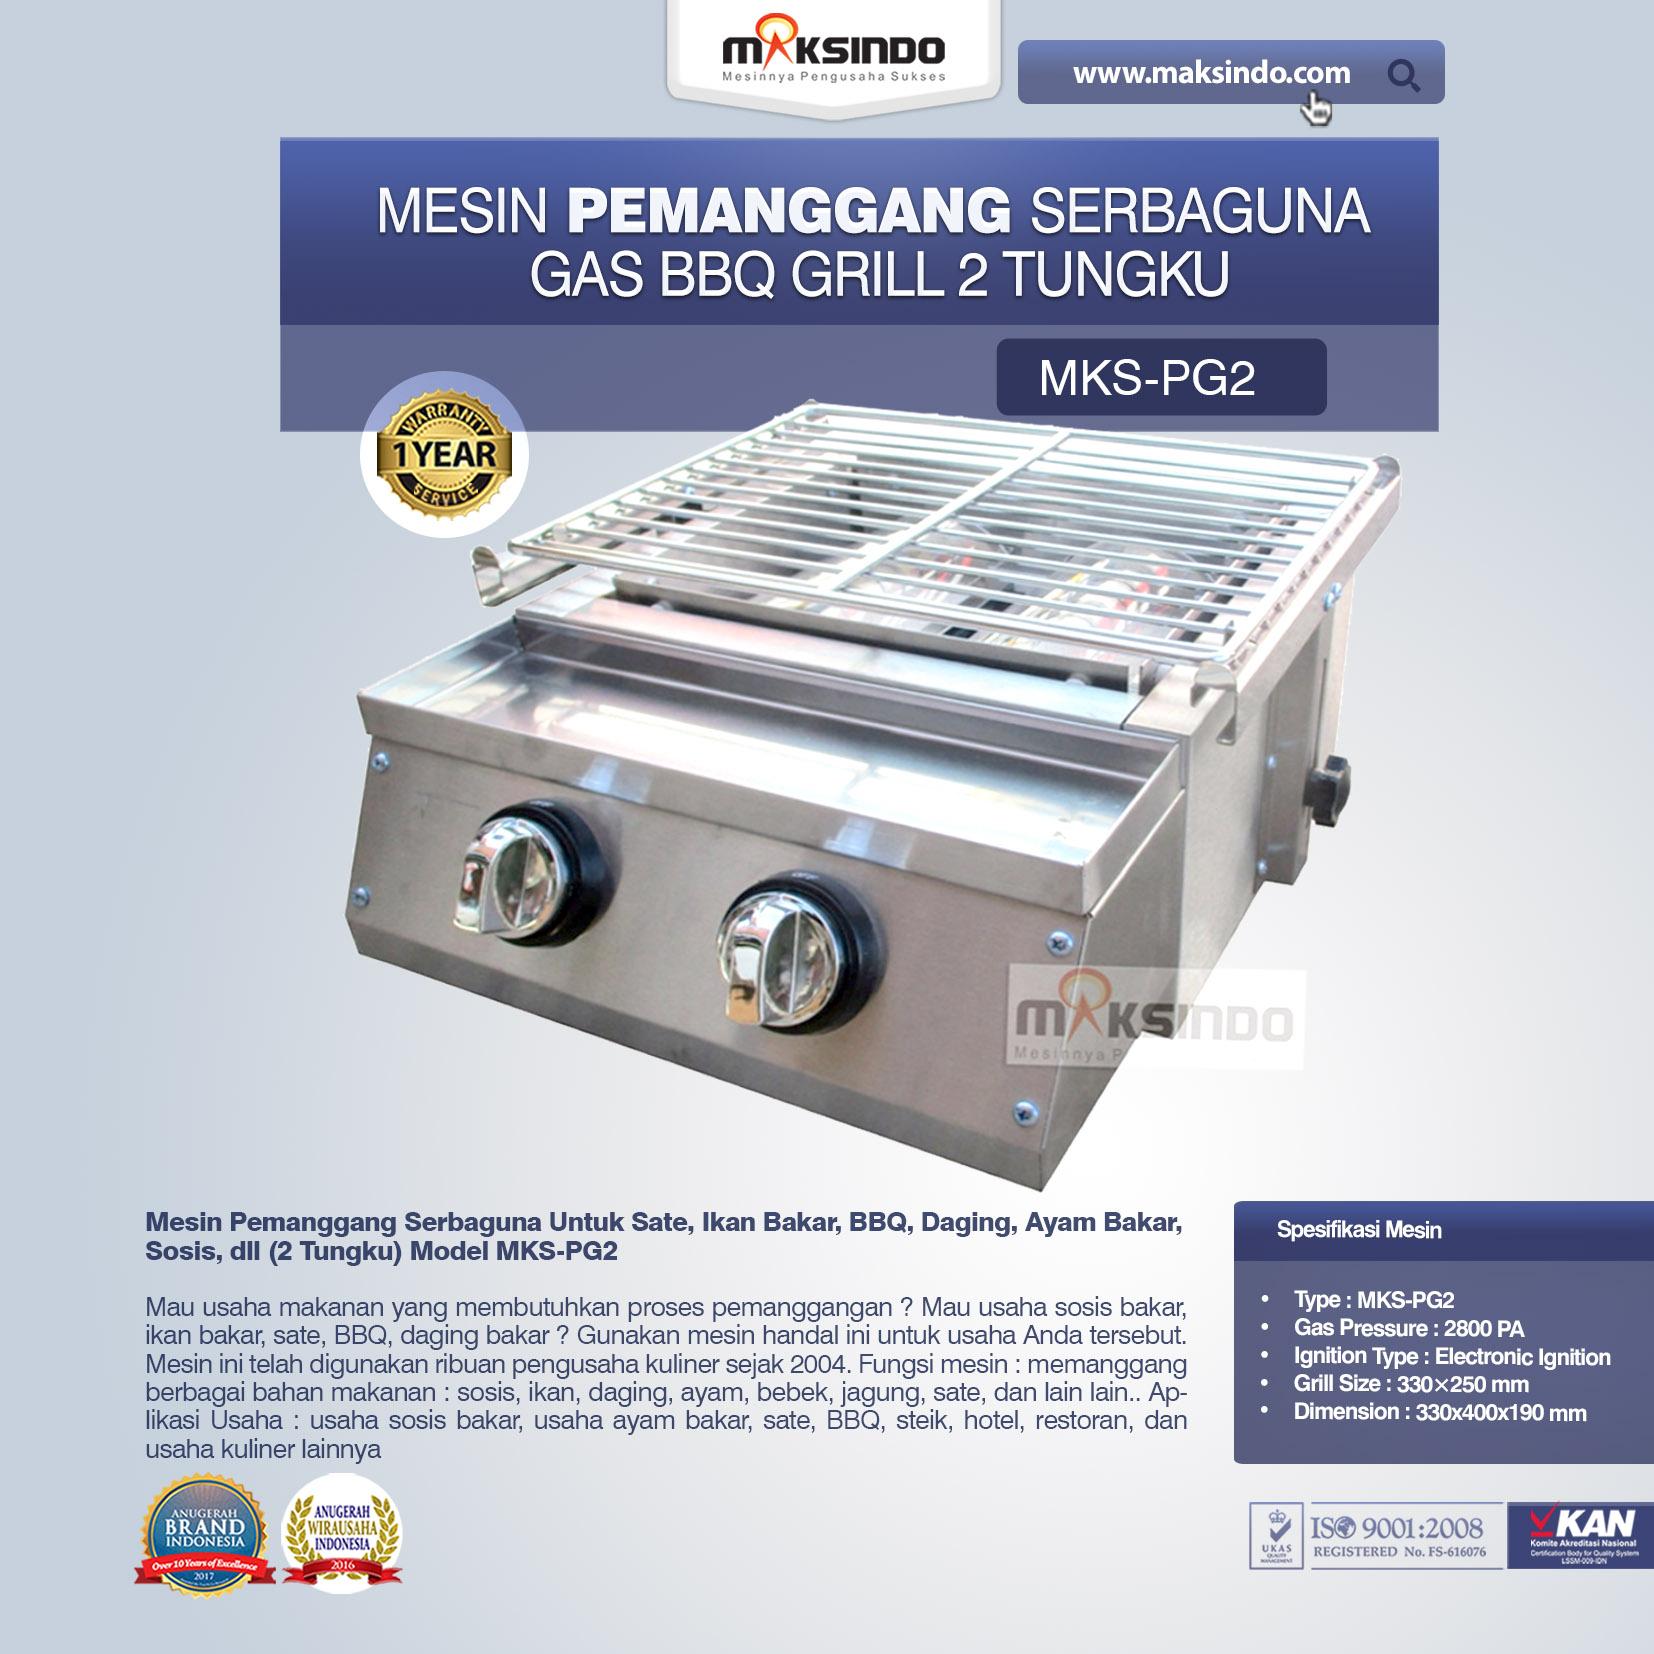 Jual Pemanggang Serbaguna – Gas BBQ Grill 2 Tungku Full Stainless di Bekasi